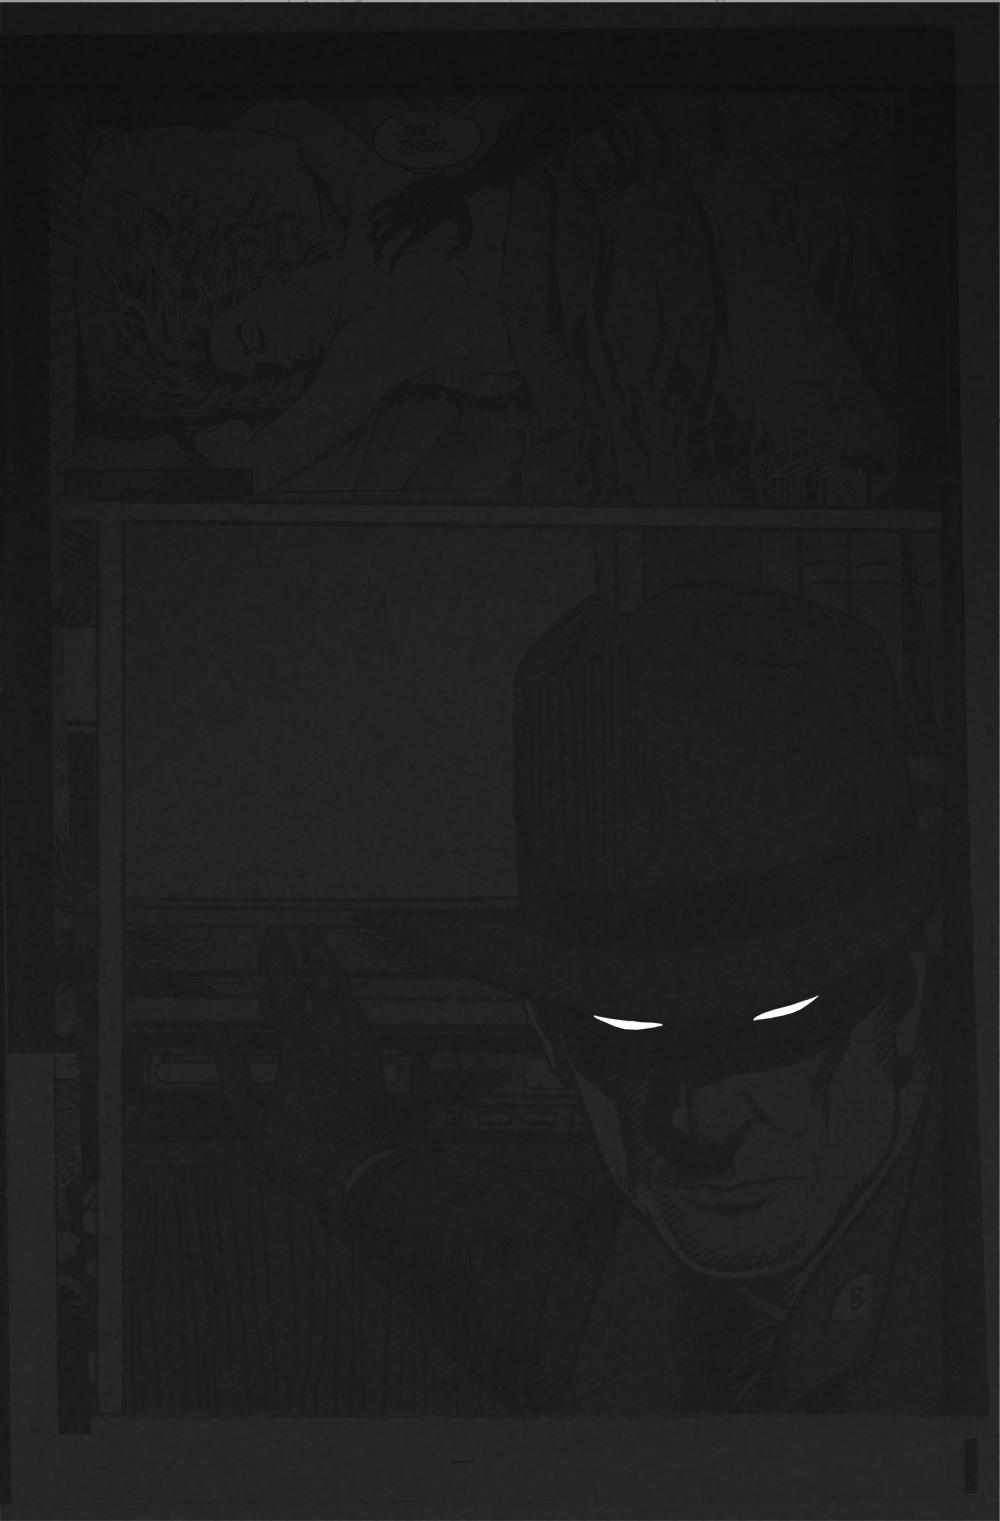 Midnight Videotape   Reconstructed Comic Book Panels. Spray paint.  84.1 x 118.9 cm